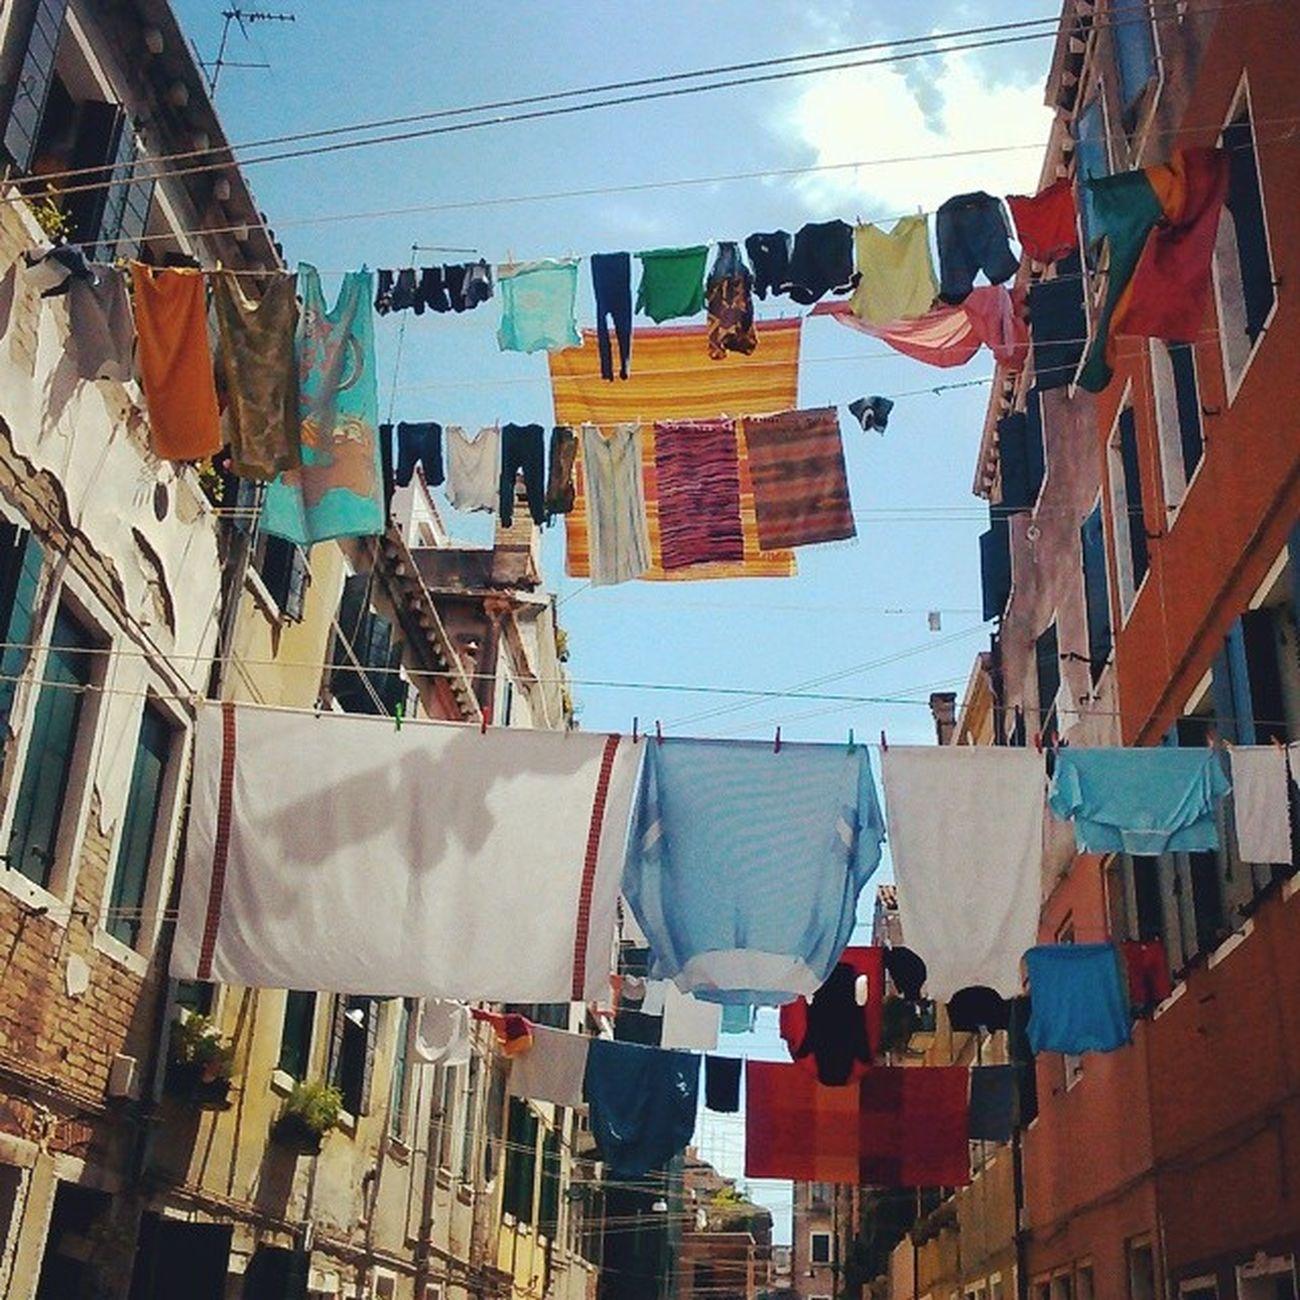 Venice Venicelife Colours Street Life viagaribaldi castello